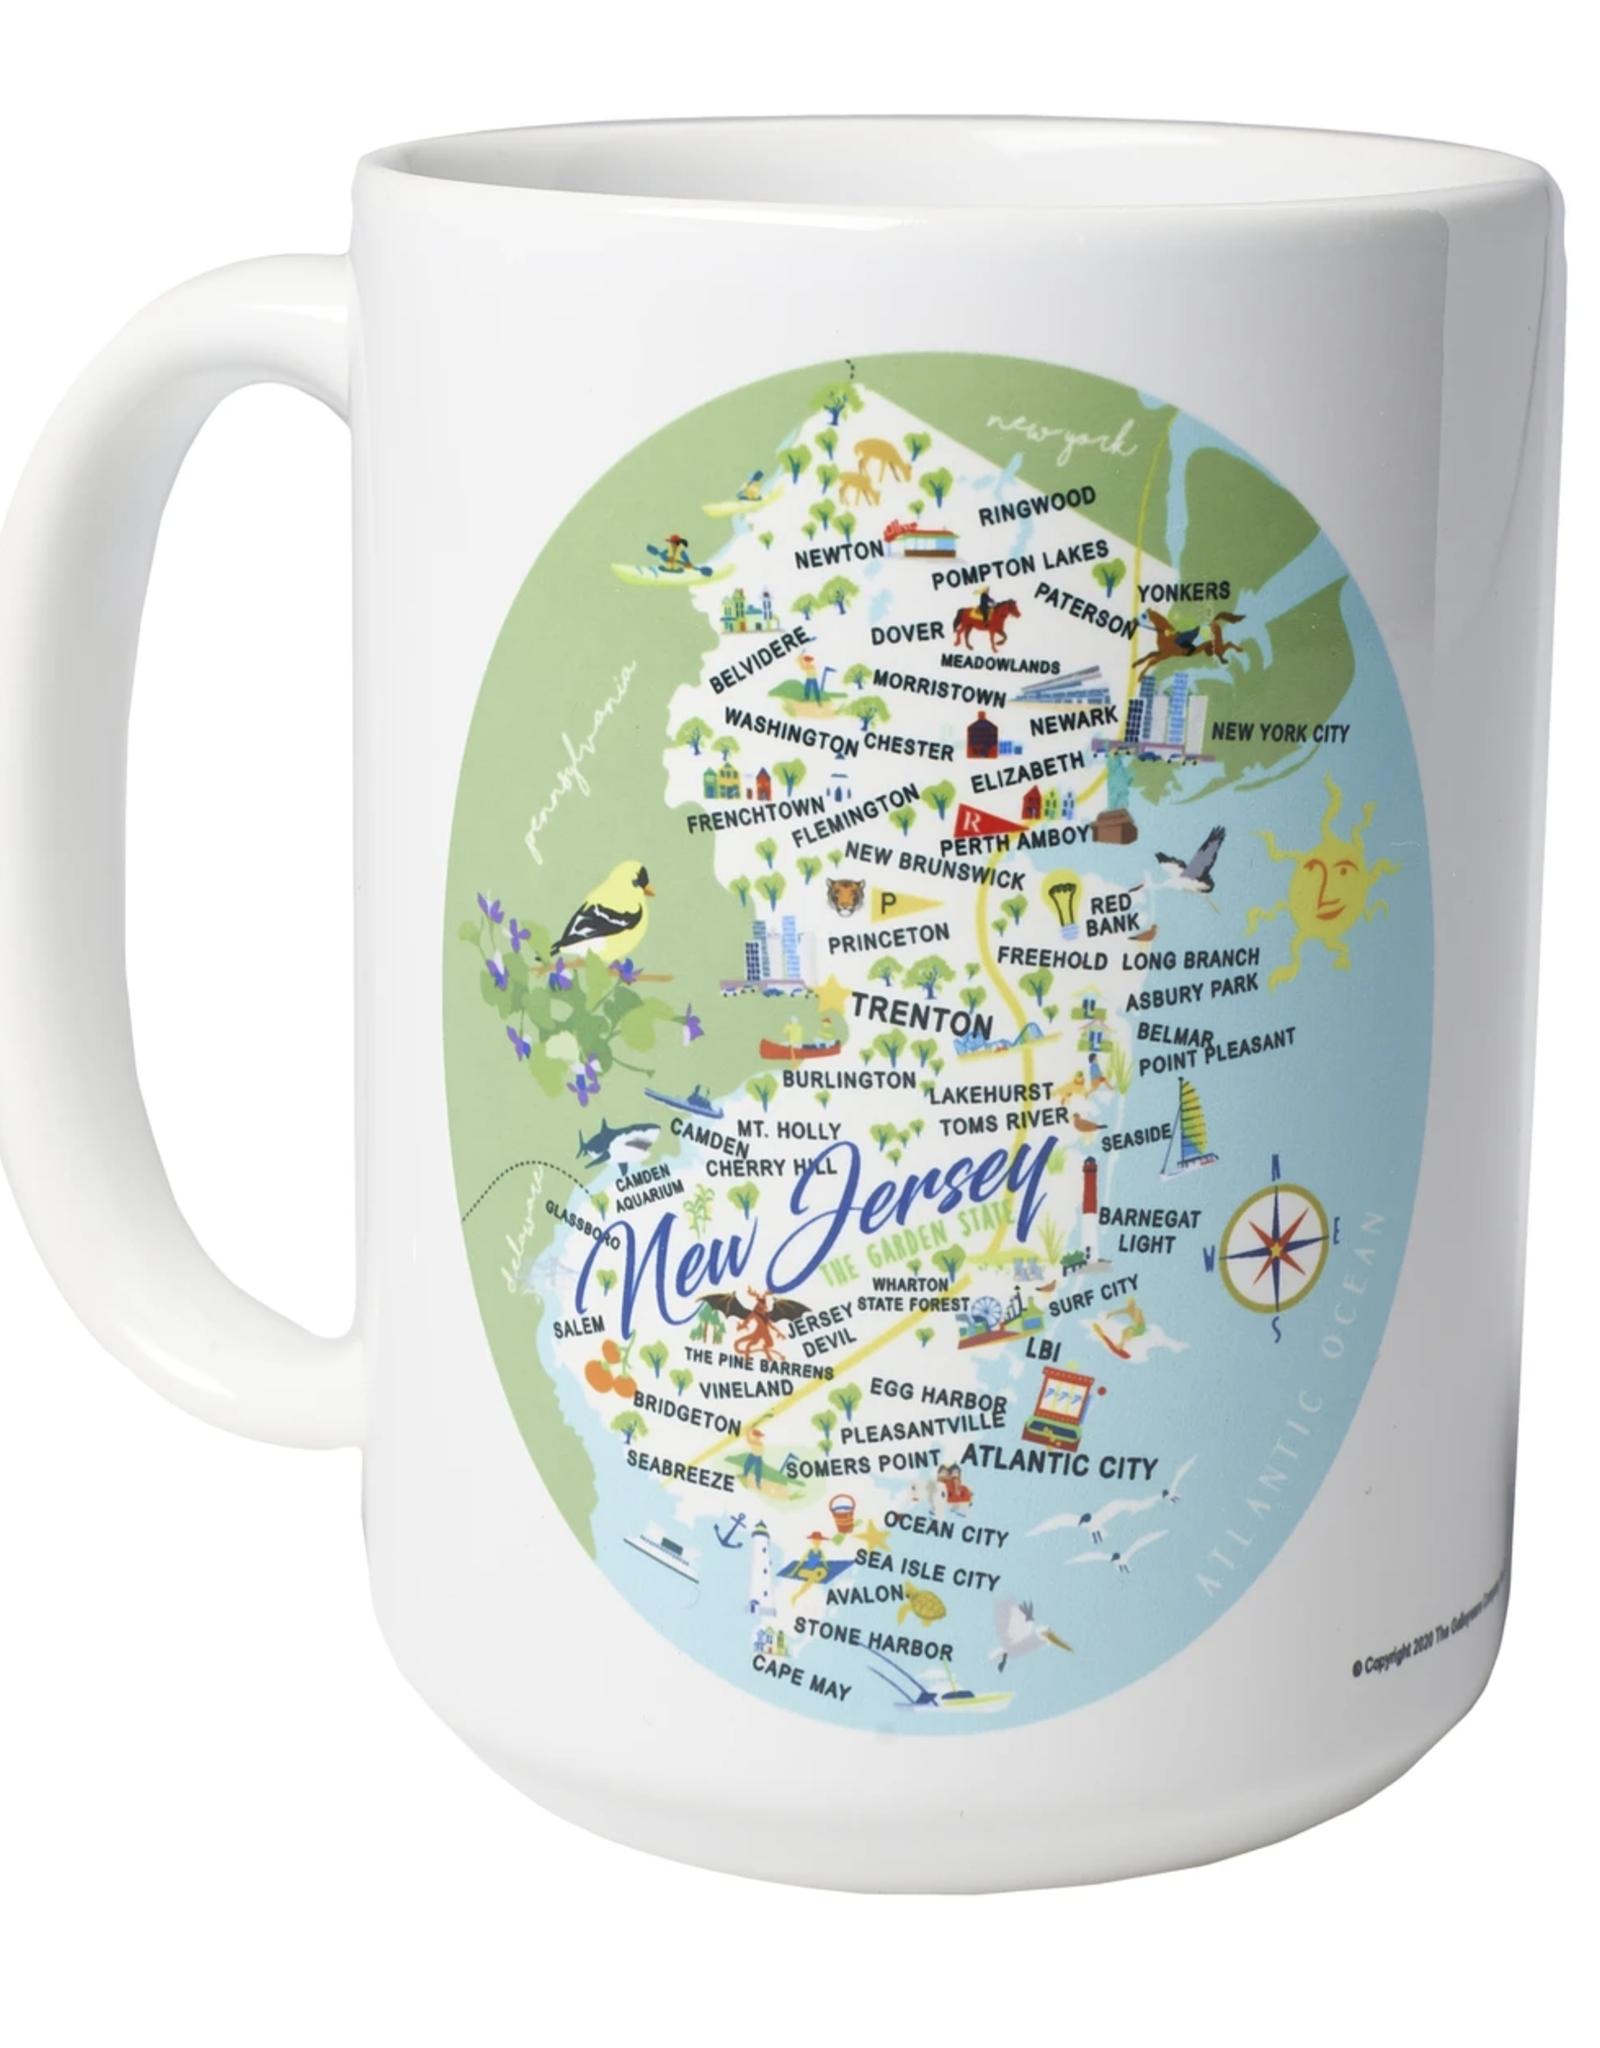 New Jersey - 15-oz. Ceramic Mug